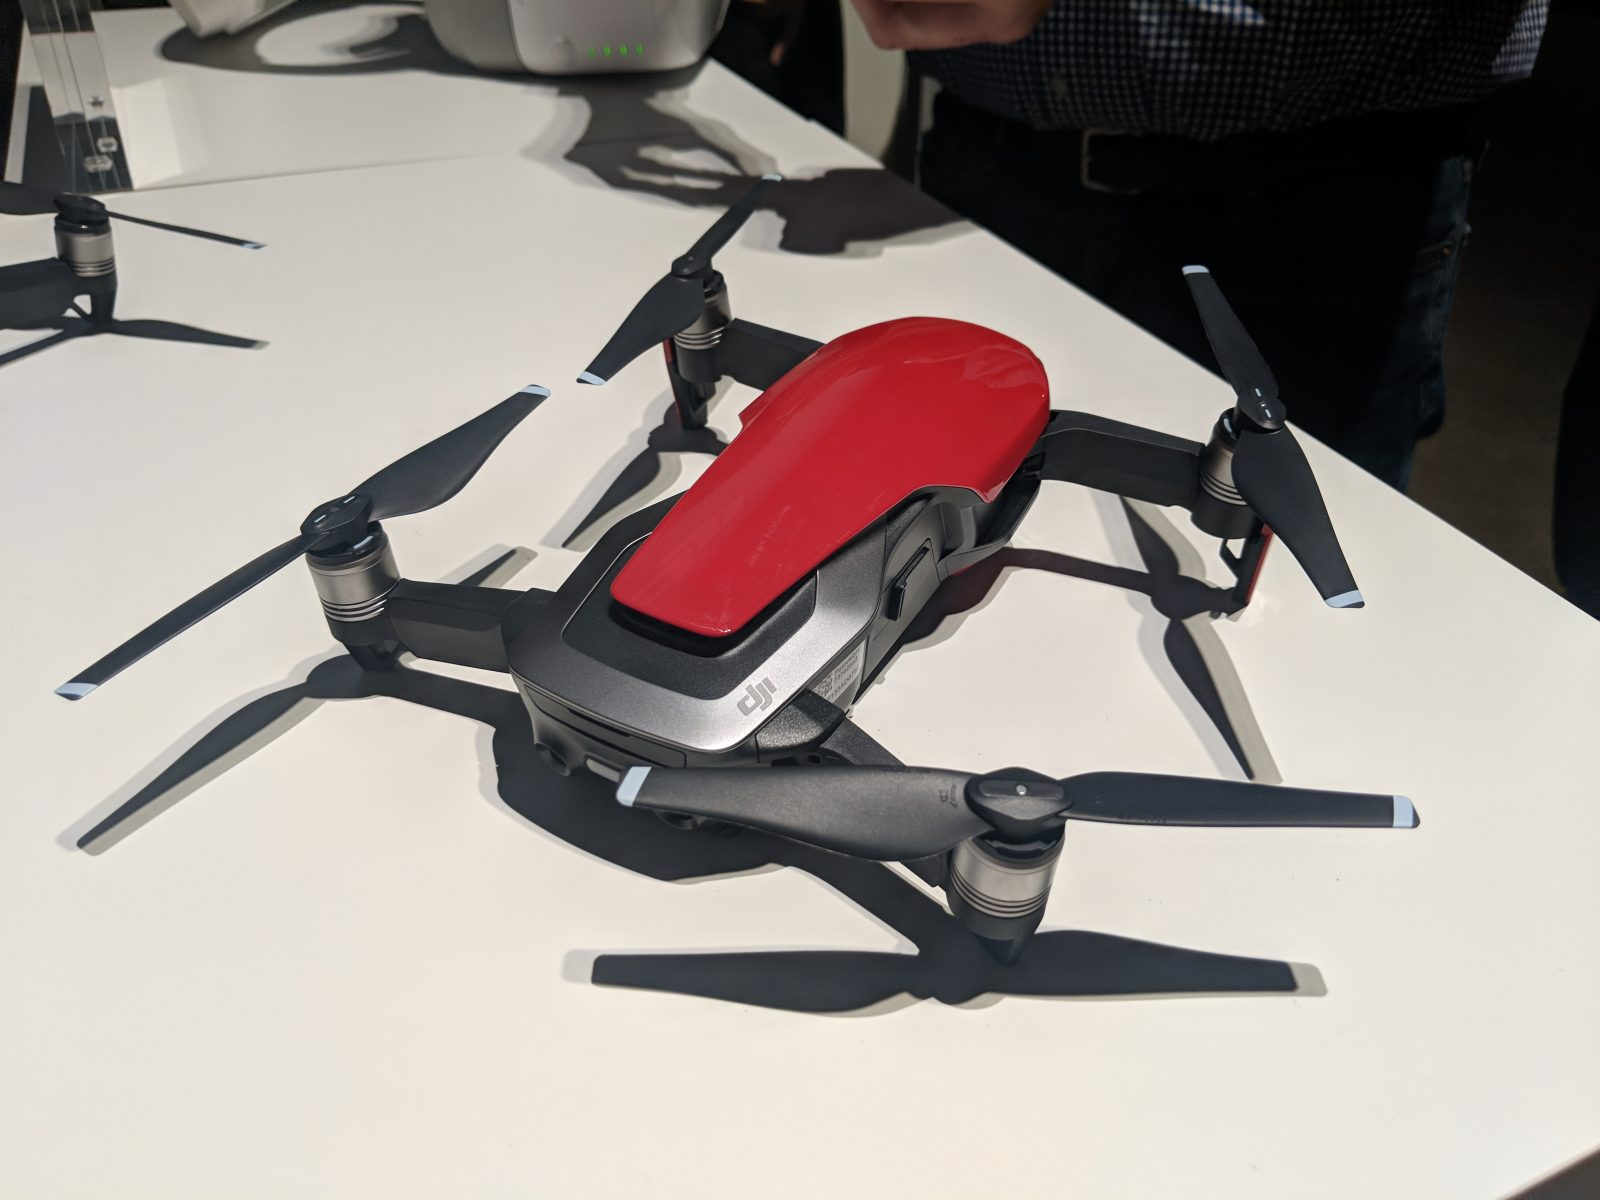 DJI Mavic Air - Drone - Red